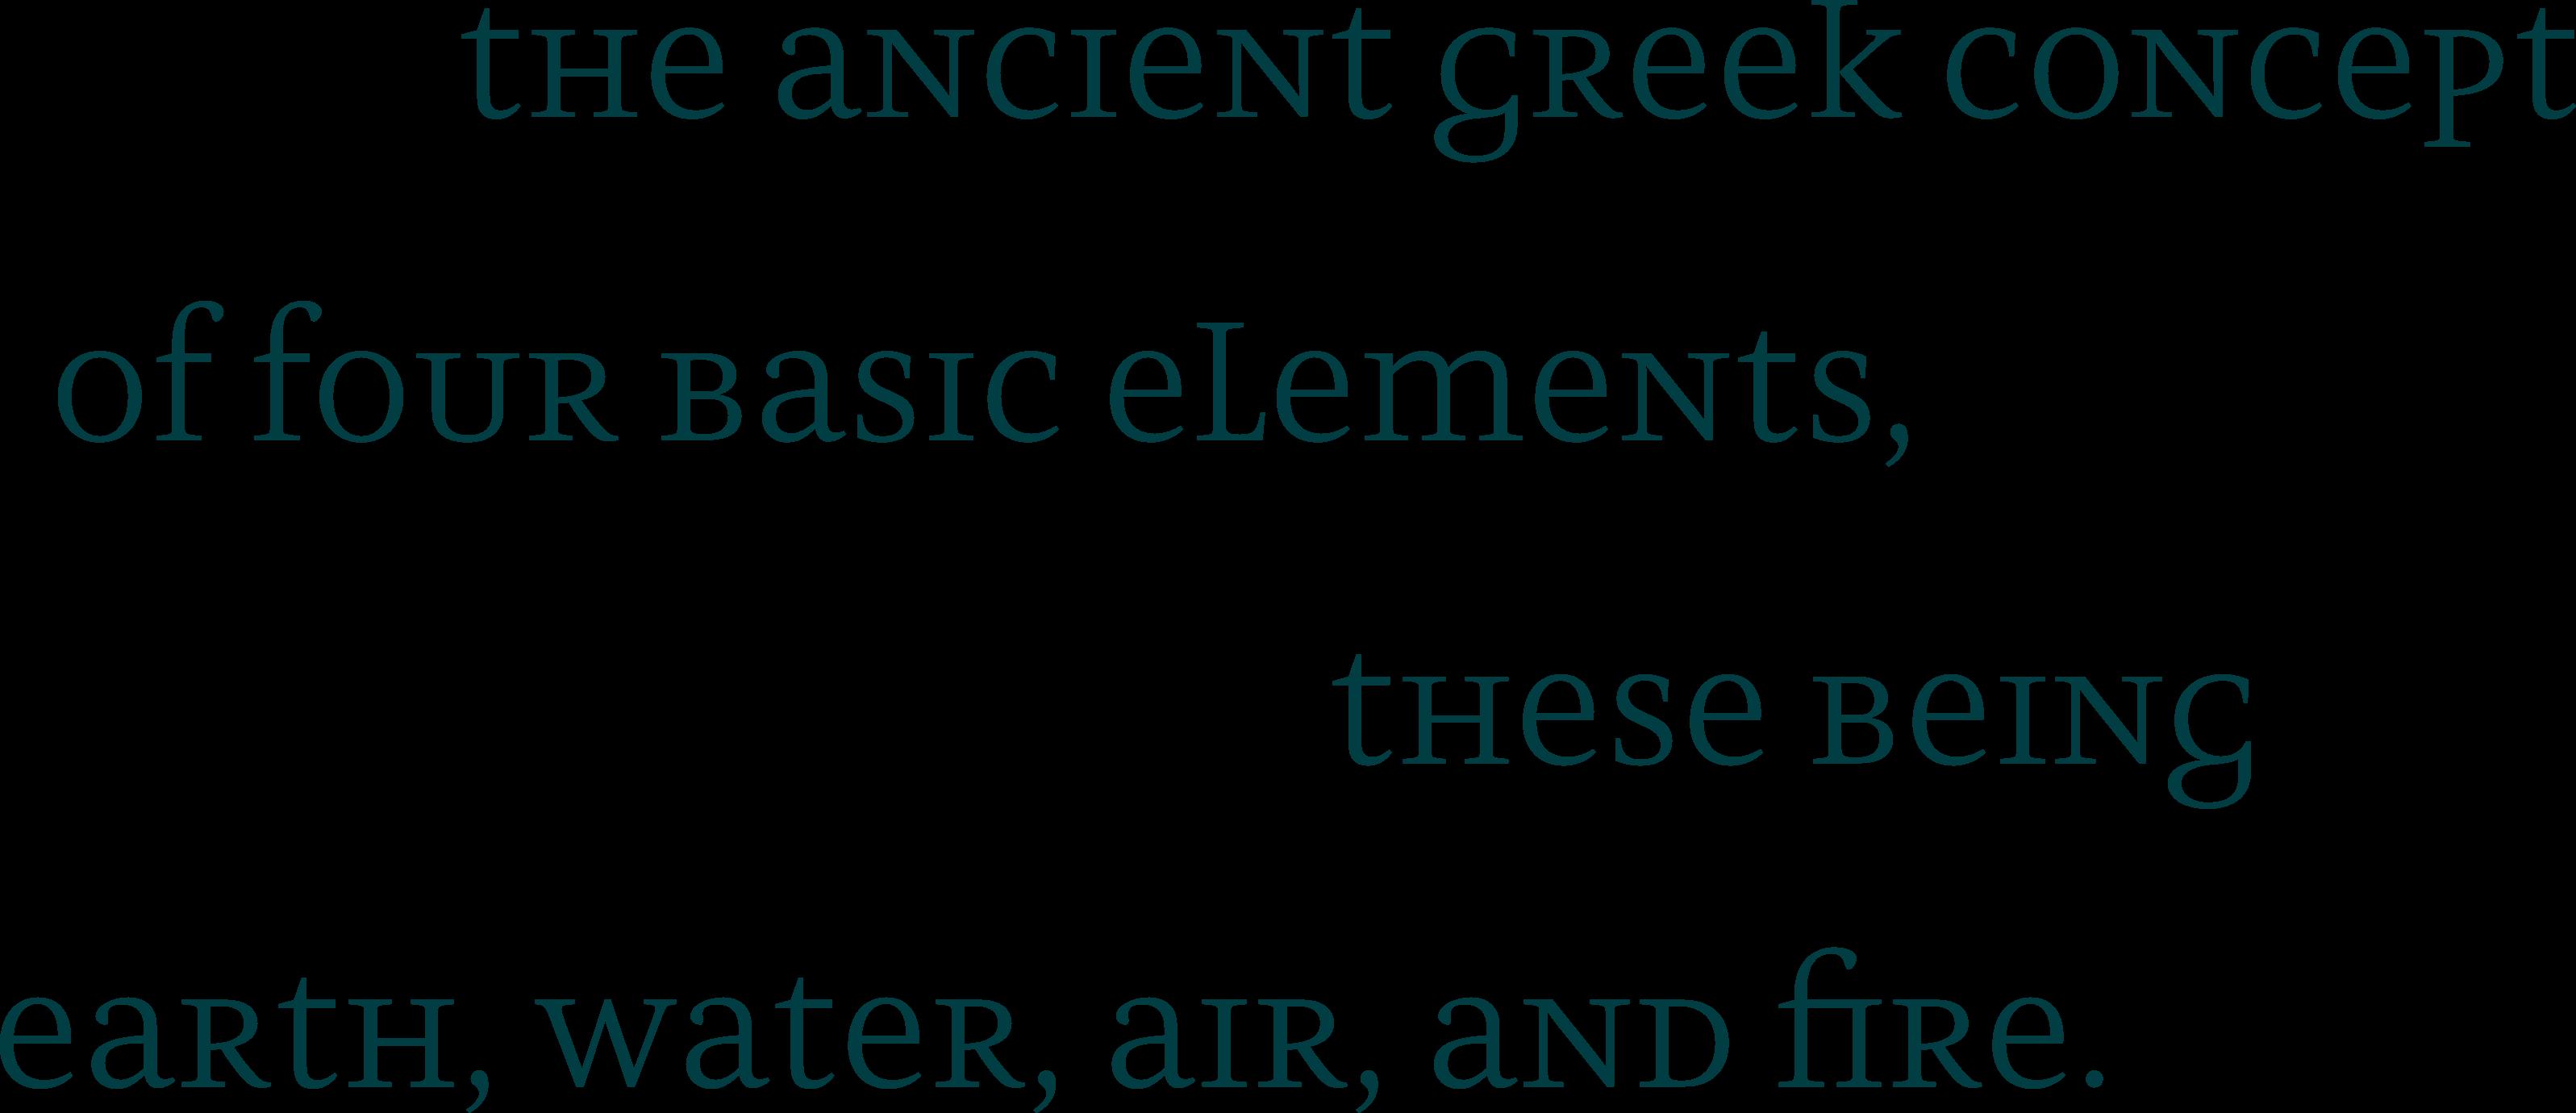 Image-Elements